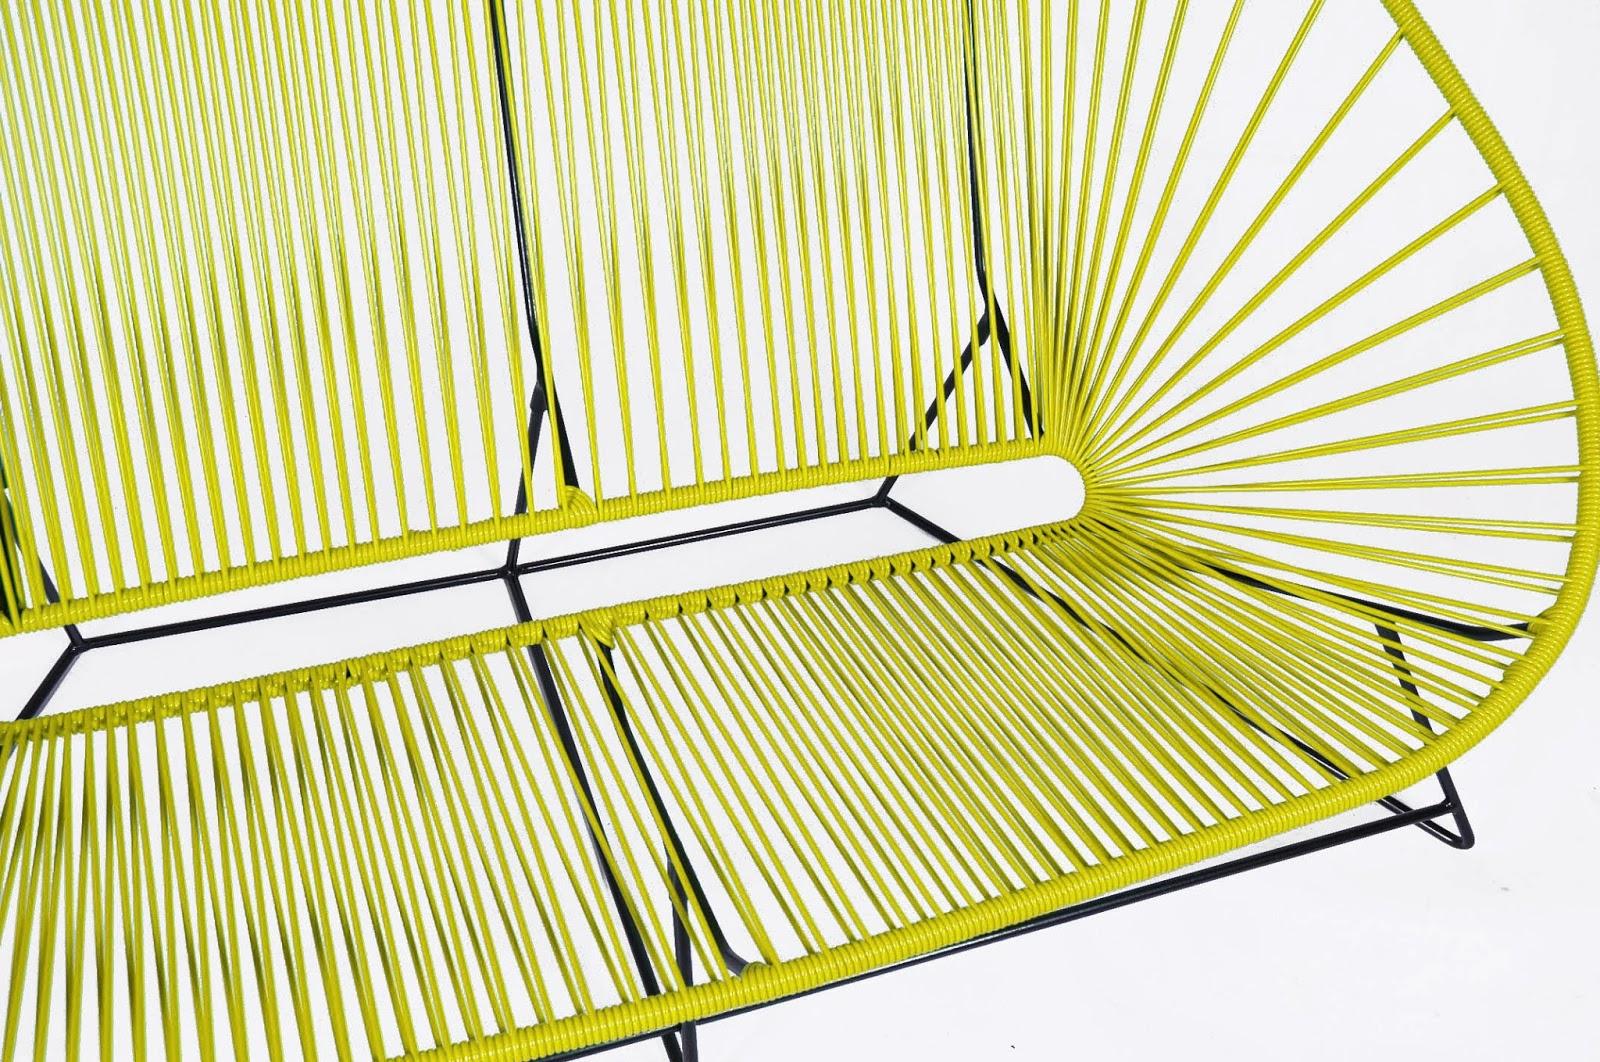 mobilier scoubidou le canap acapulco. Black Bedroom Furniture Sets. Home Design Ideas